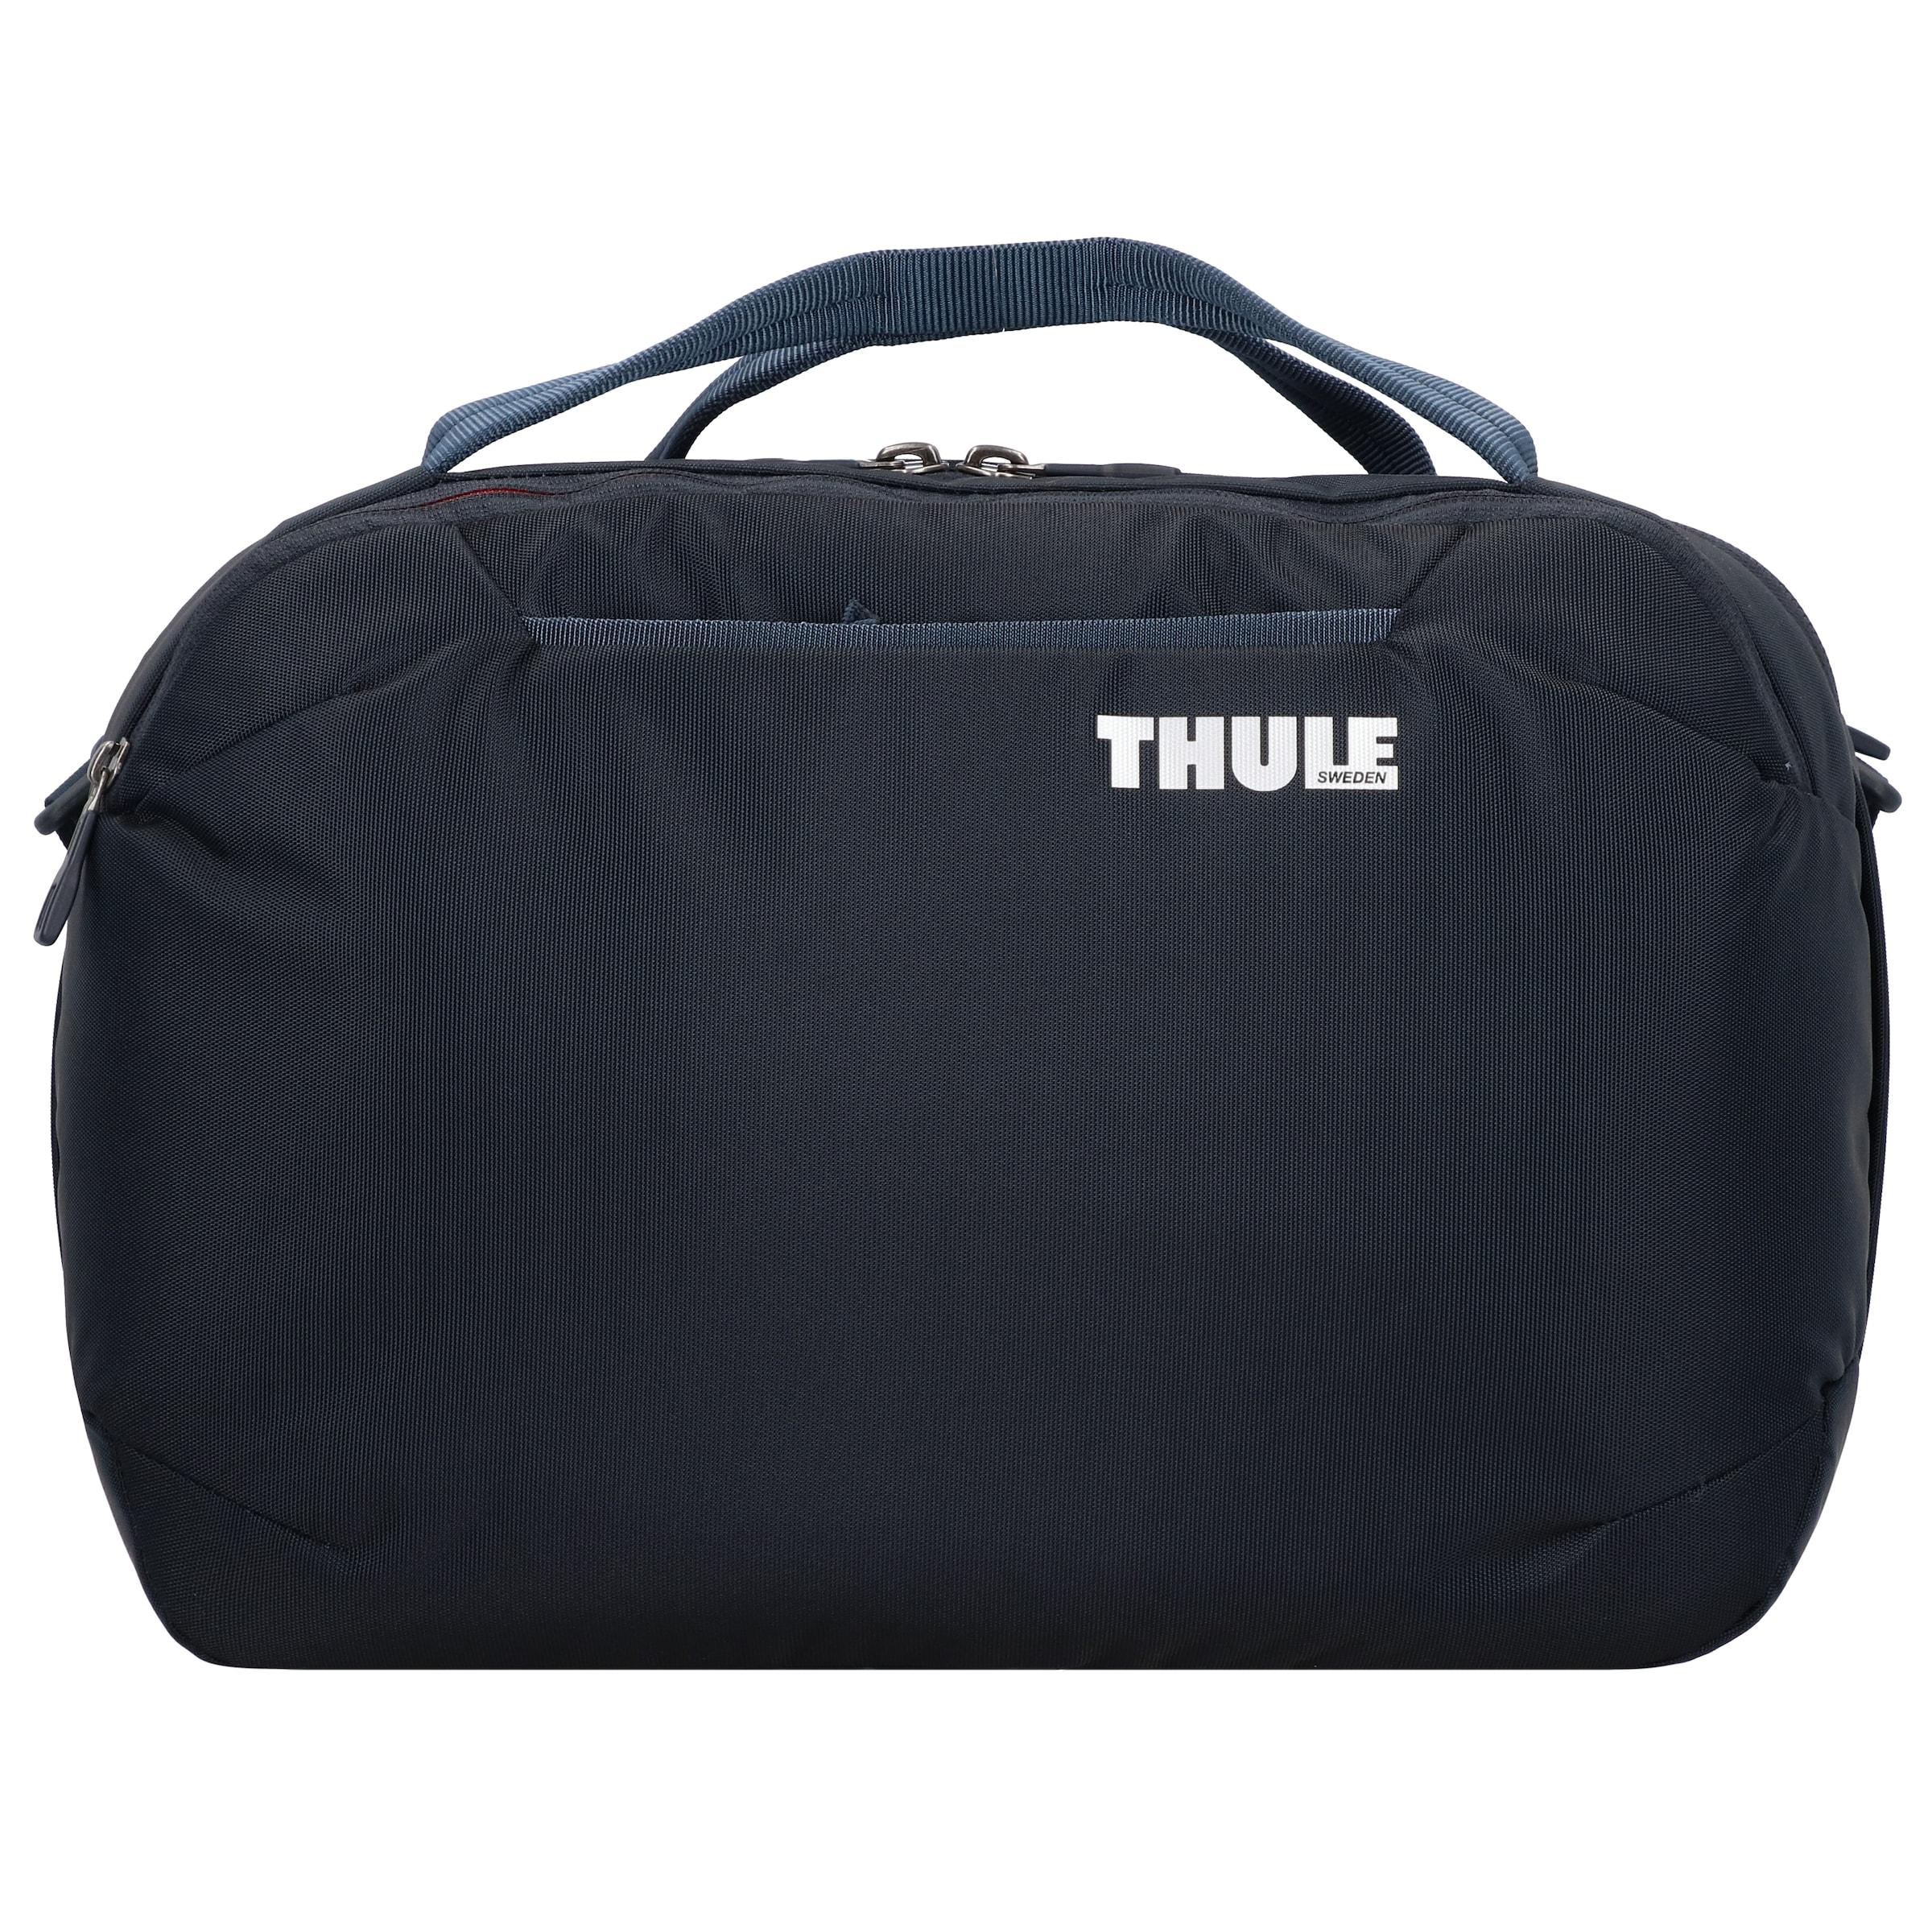 Thule Flugumhänger 'Subterra' in dunkelblau